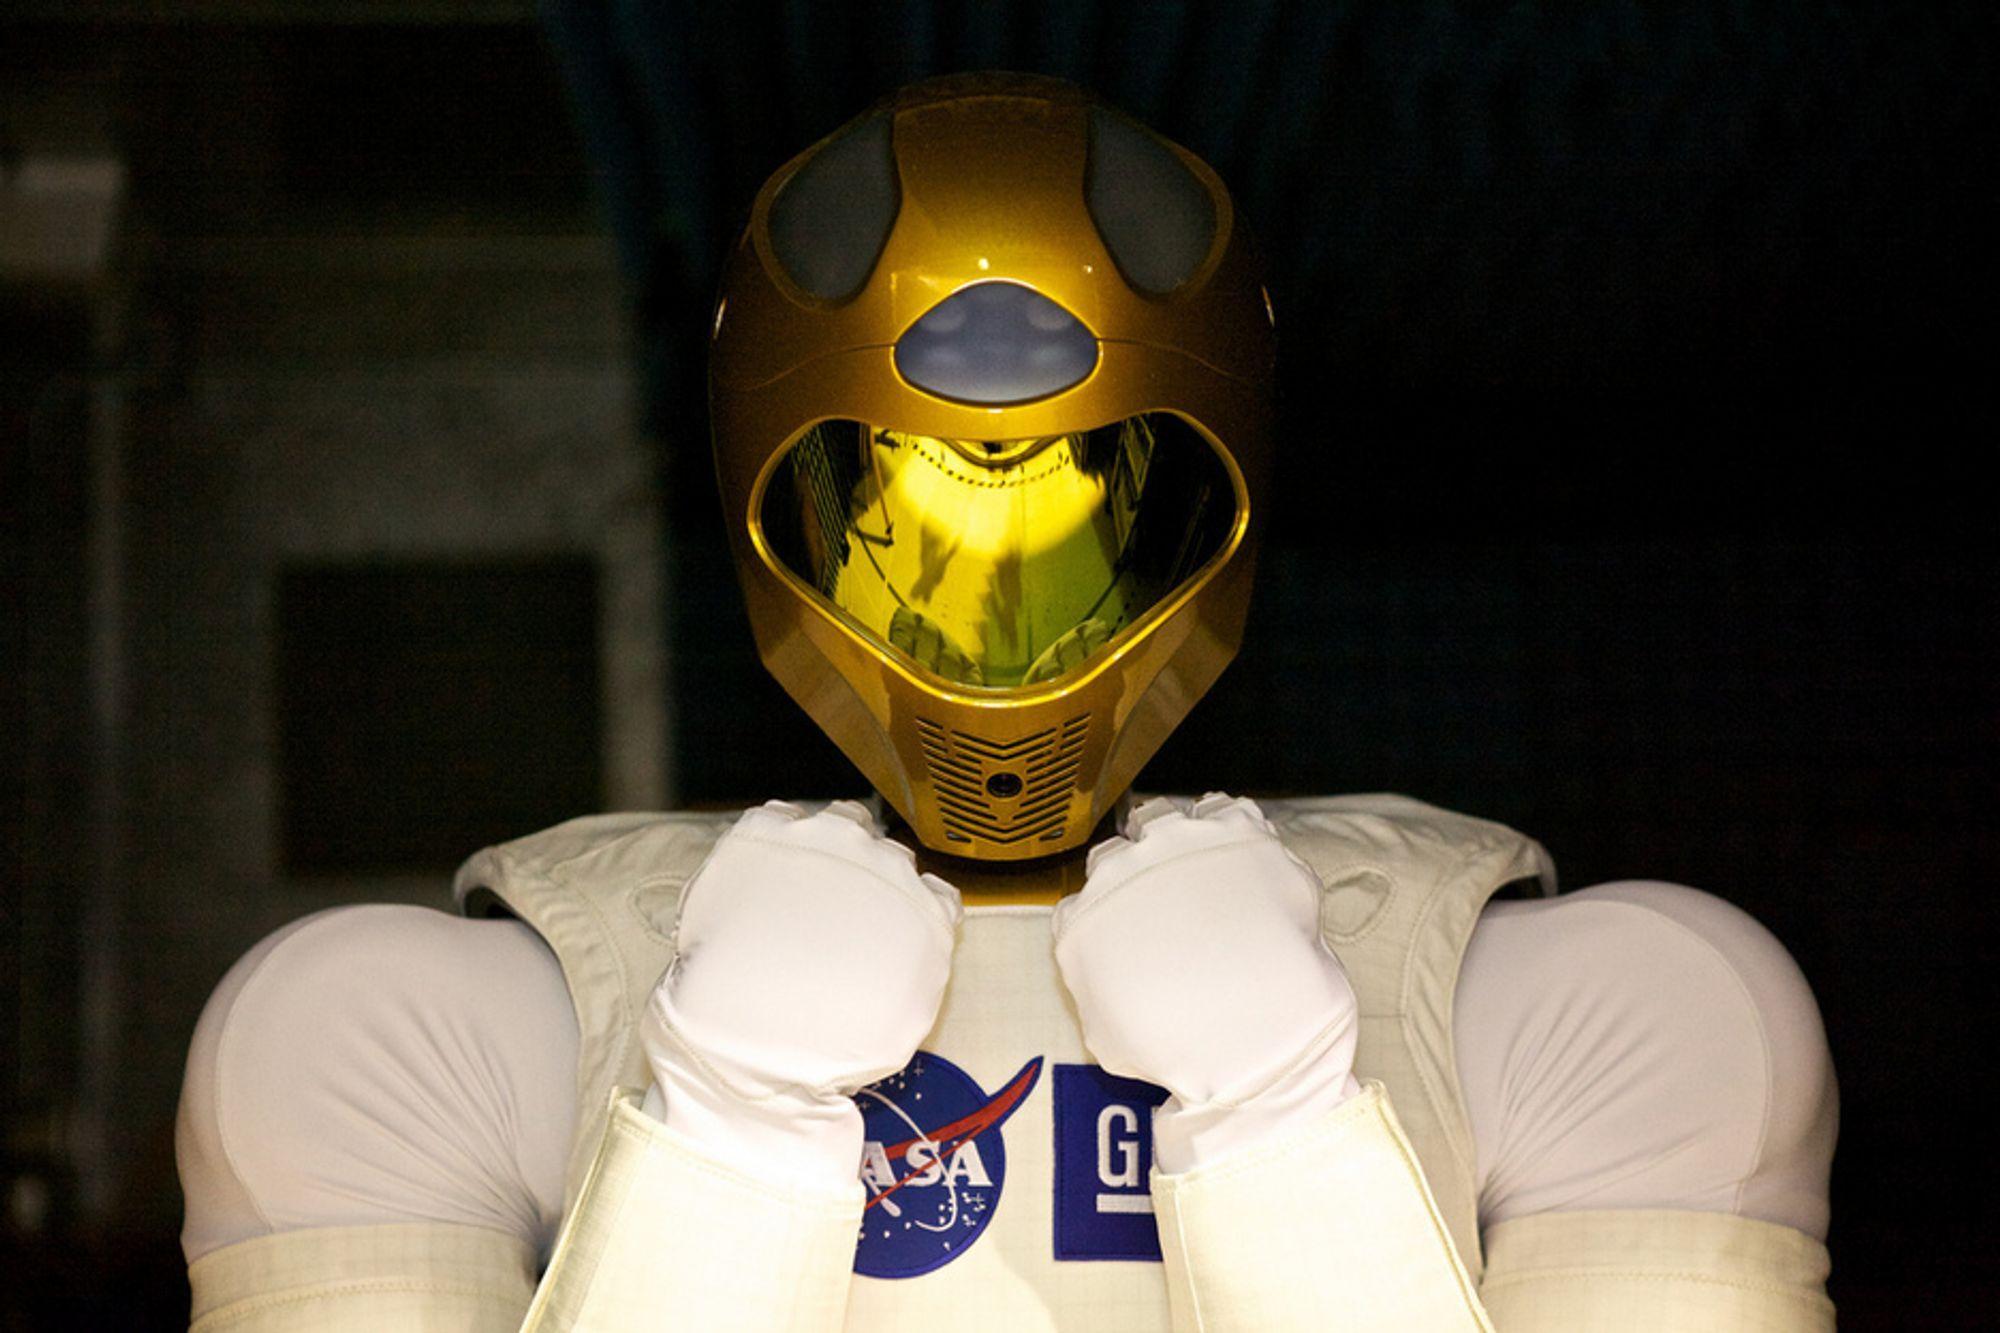 TØFFING: Roboten R2.